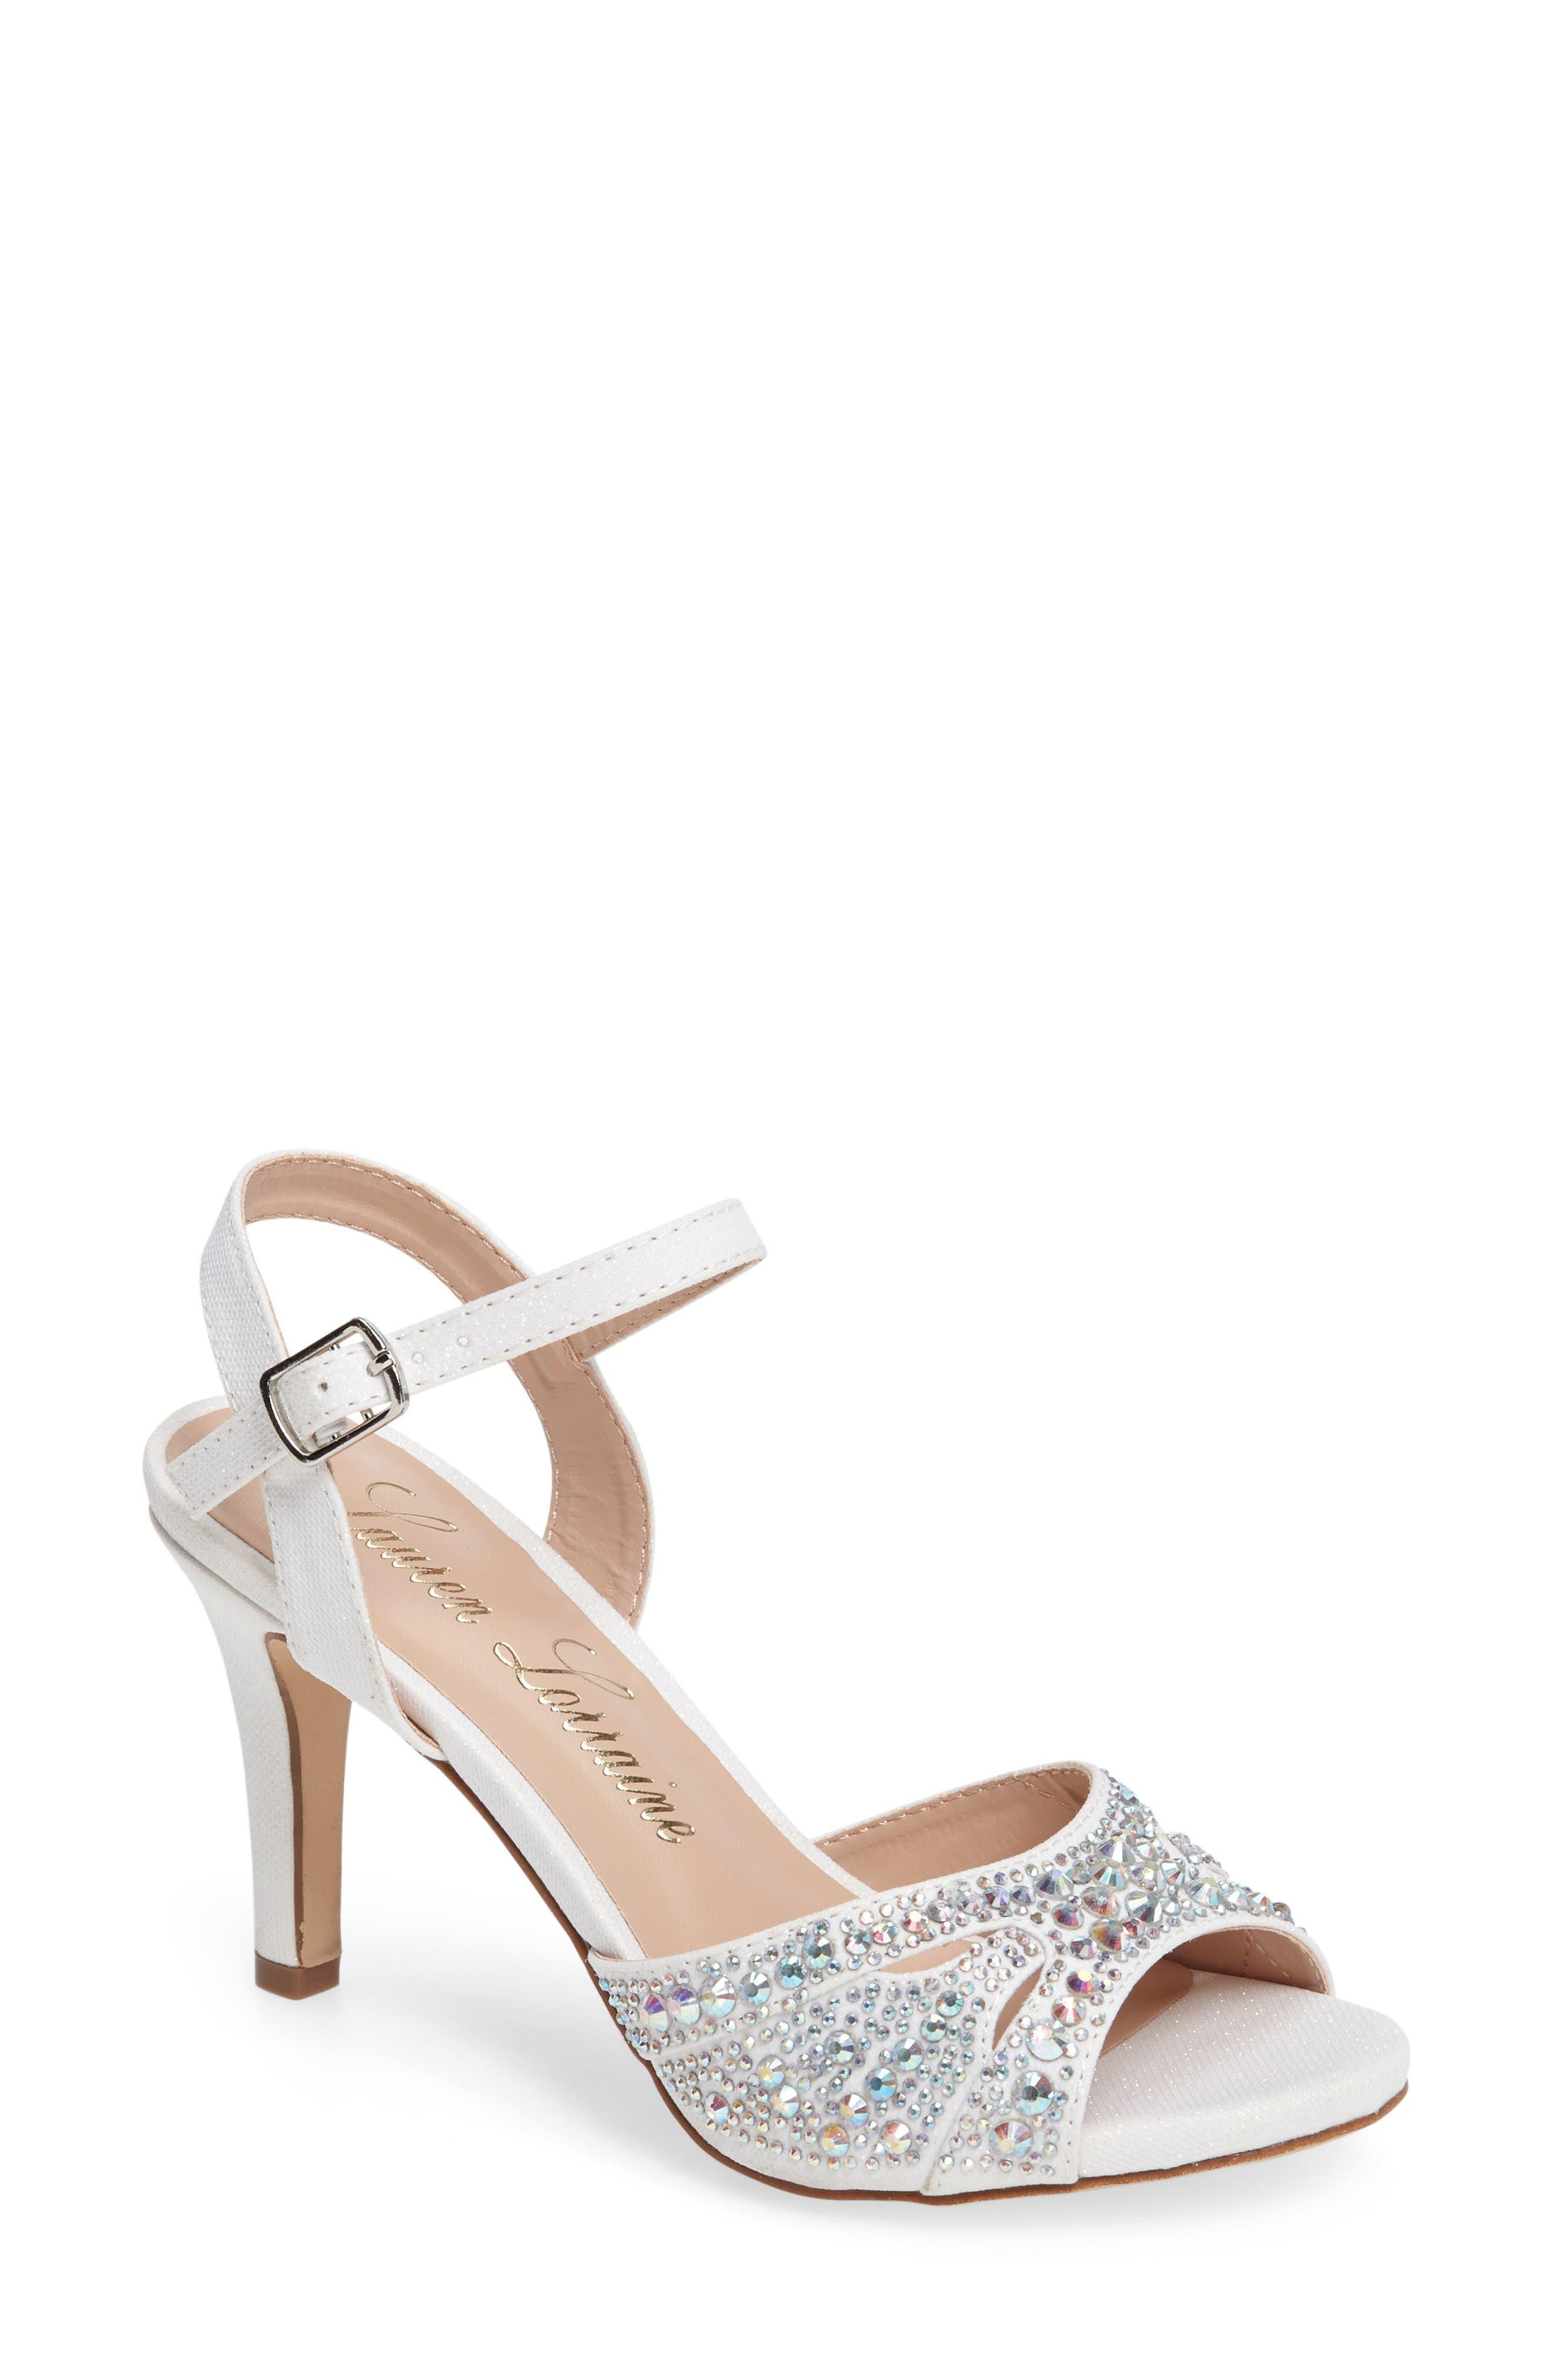 Alternate Image 1 Selected - Lauren Lorraine Florence Crystal Embellished Sandal (Women)